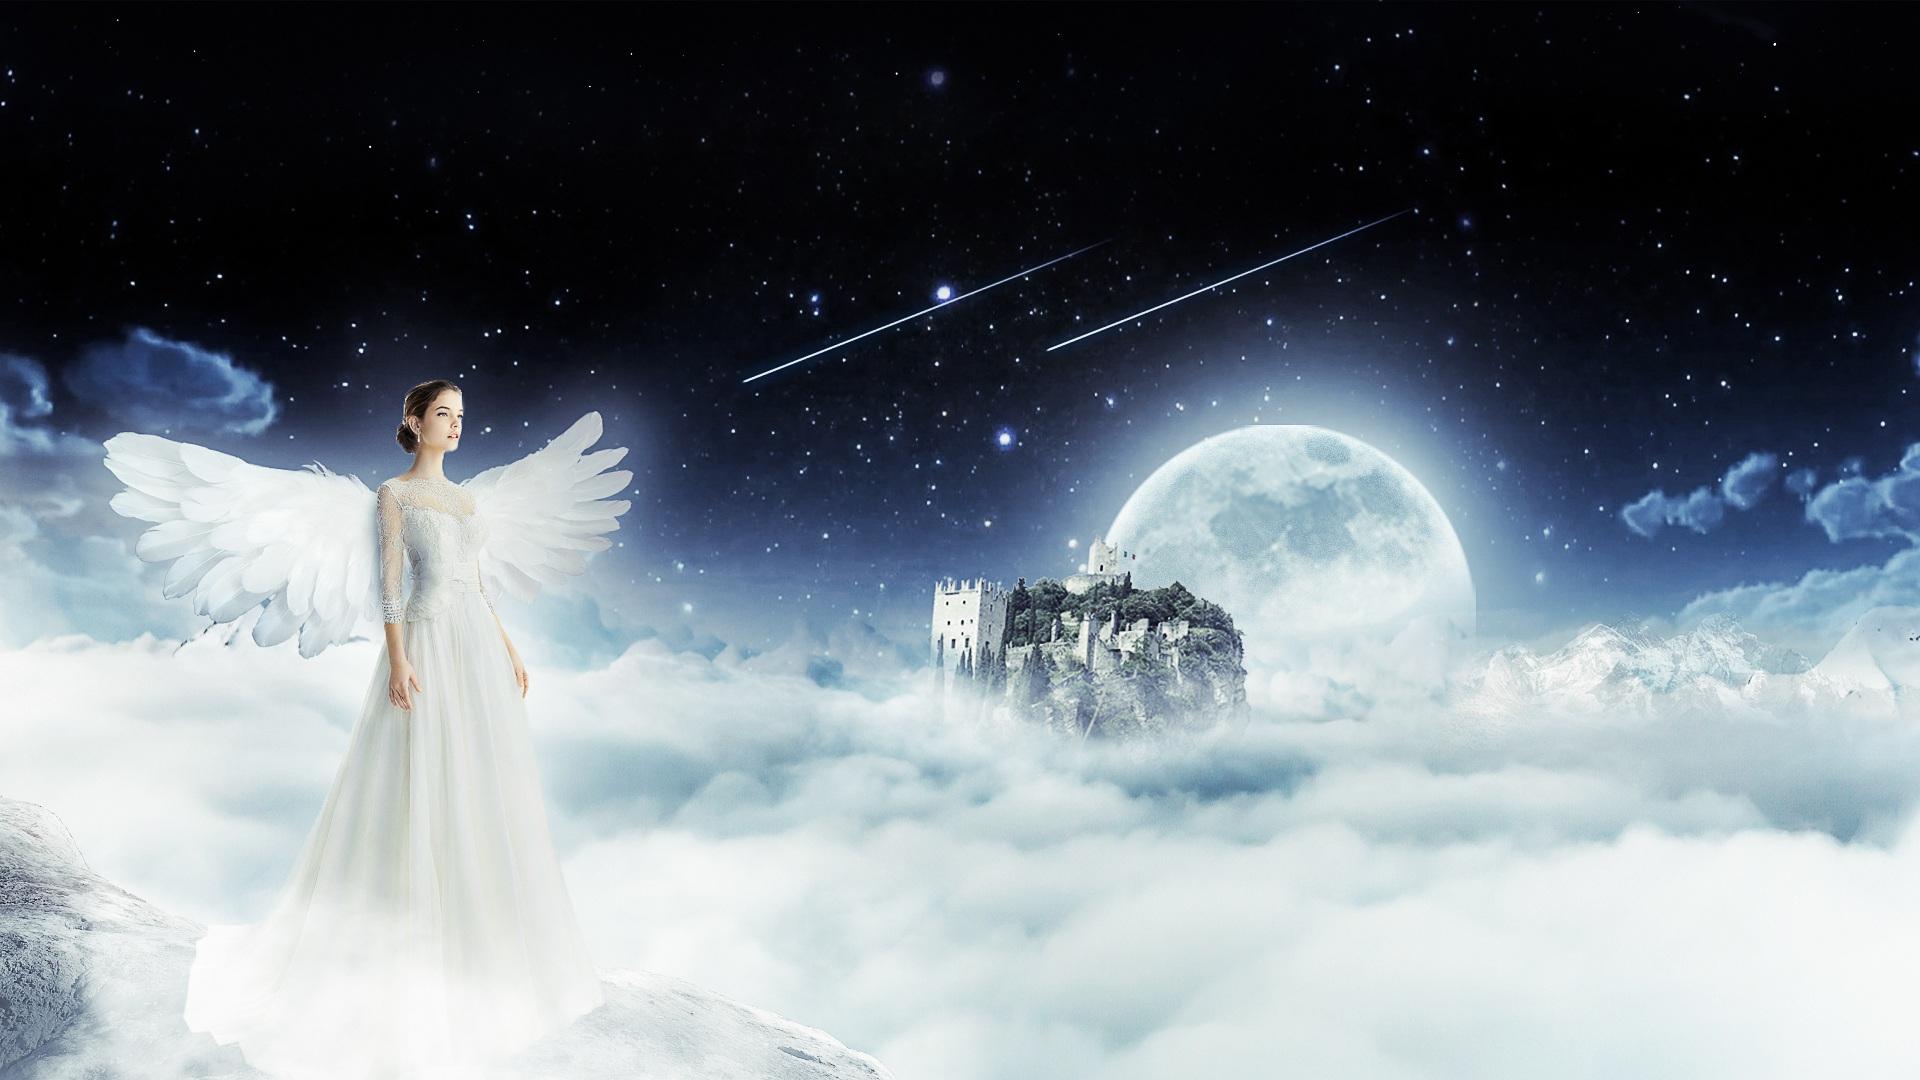 Angelo, donna, Cielo, nuvole, Luna - Sfondi HD - Professor-falken.com